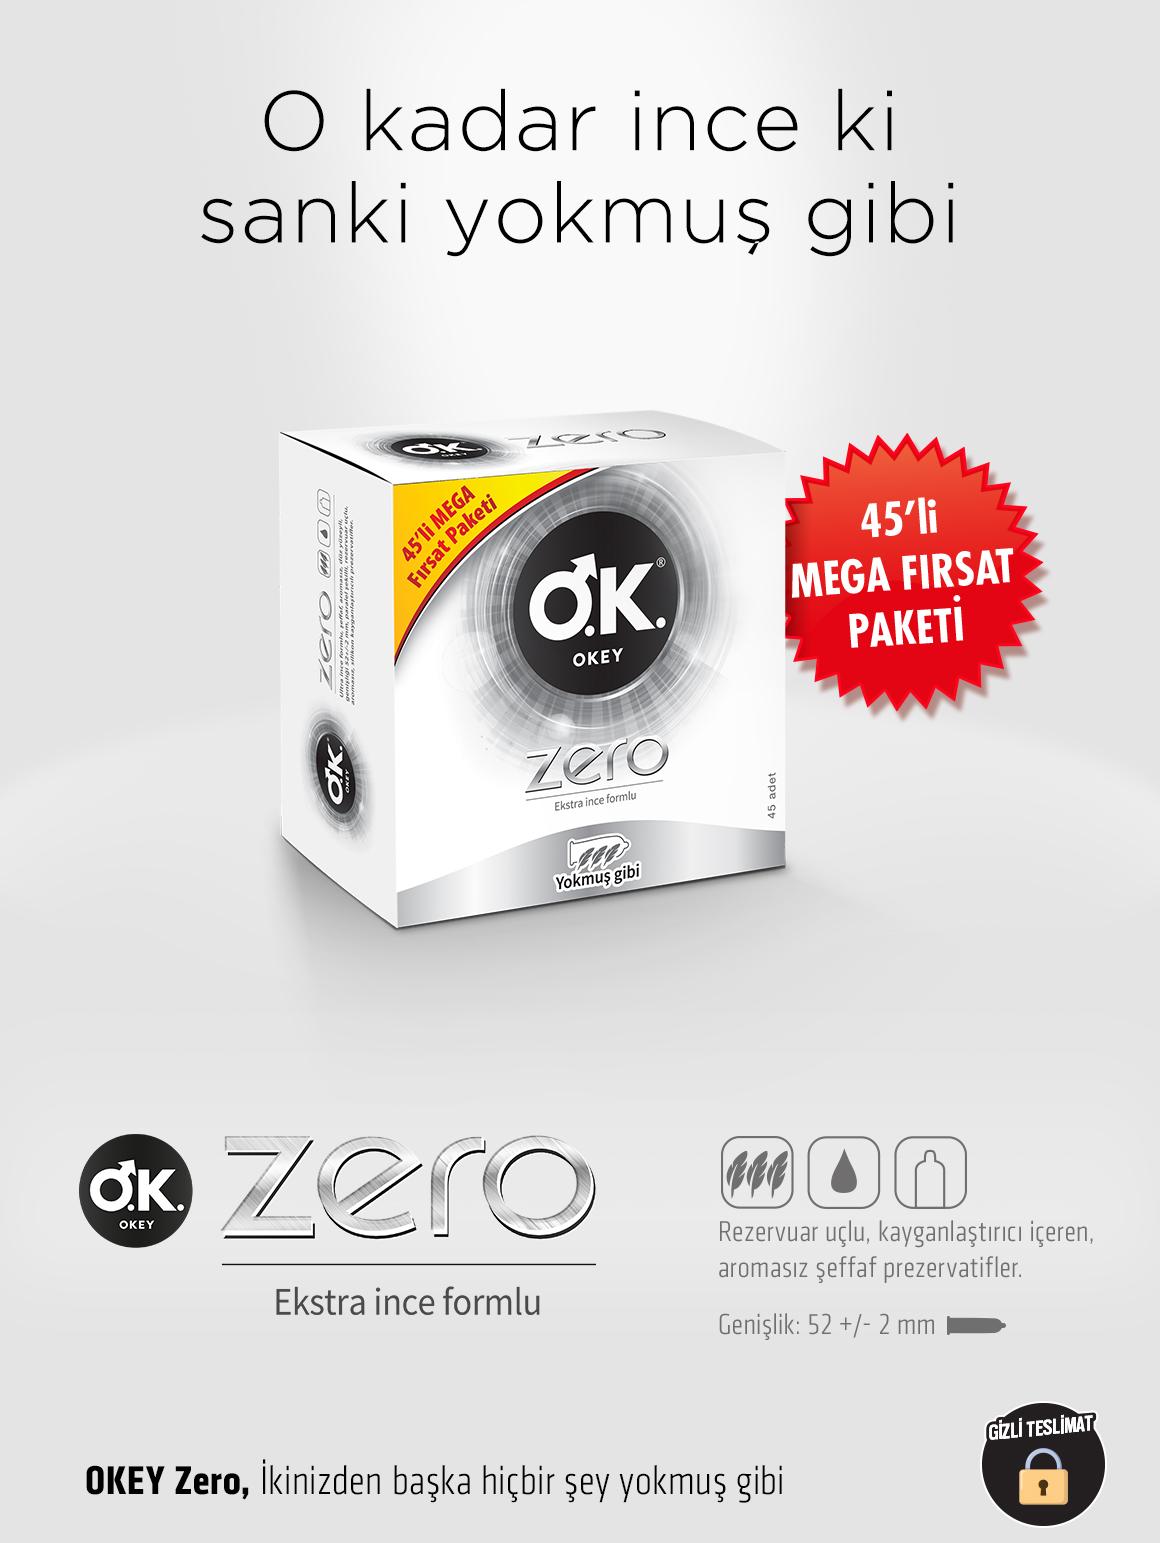 Okey Zero 45 Li Prezervatif Avantaj Yorumlari Sayfa 2